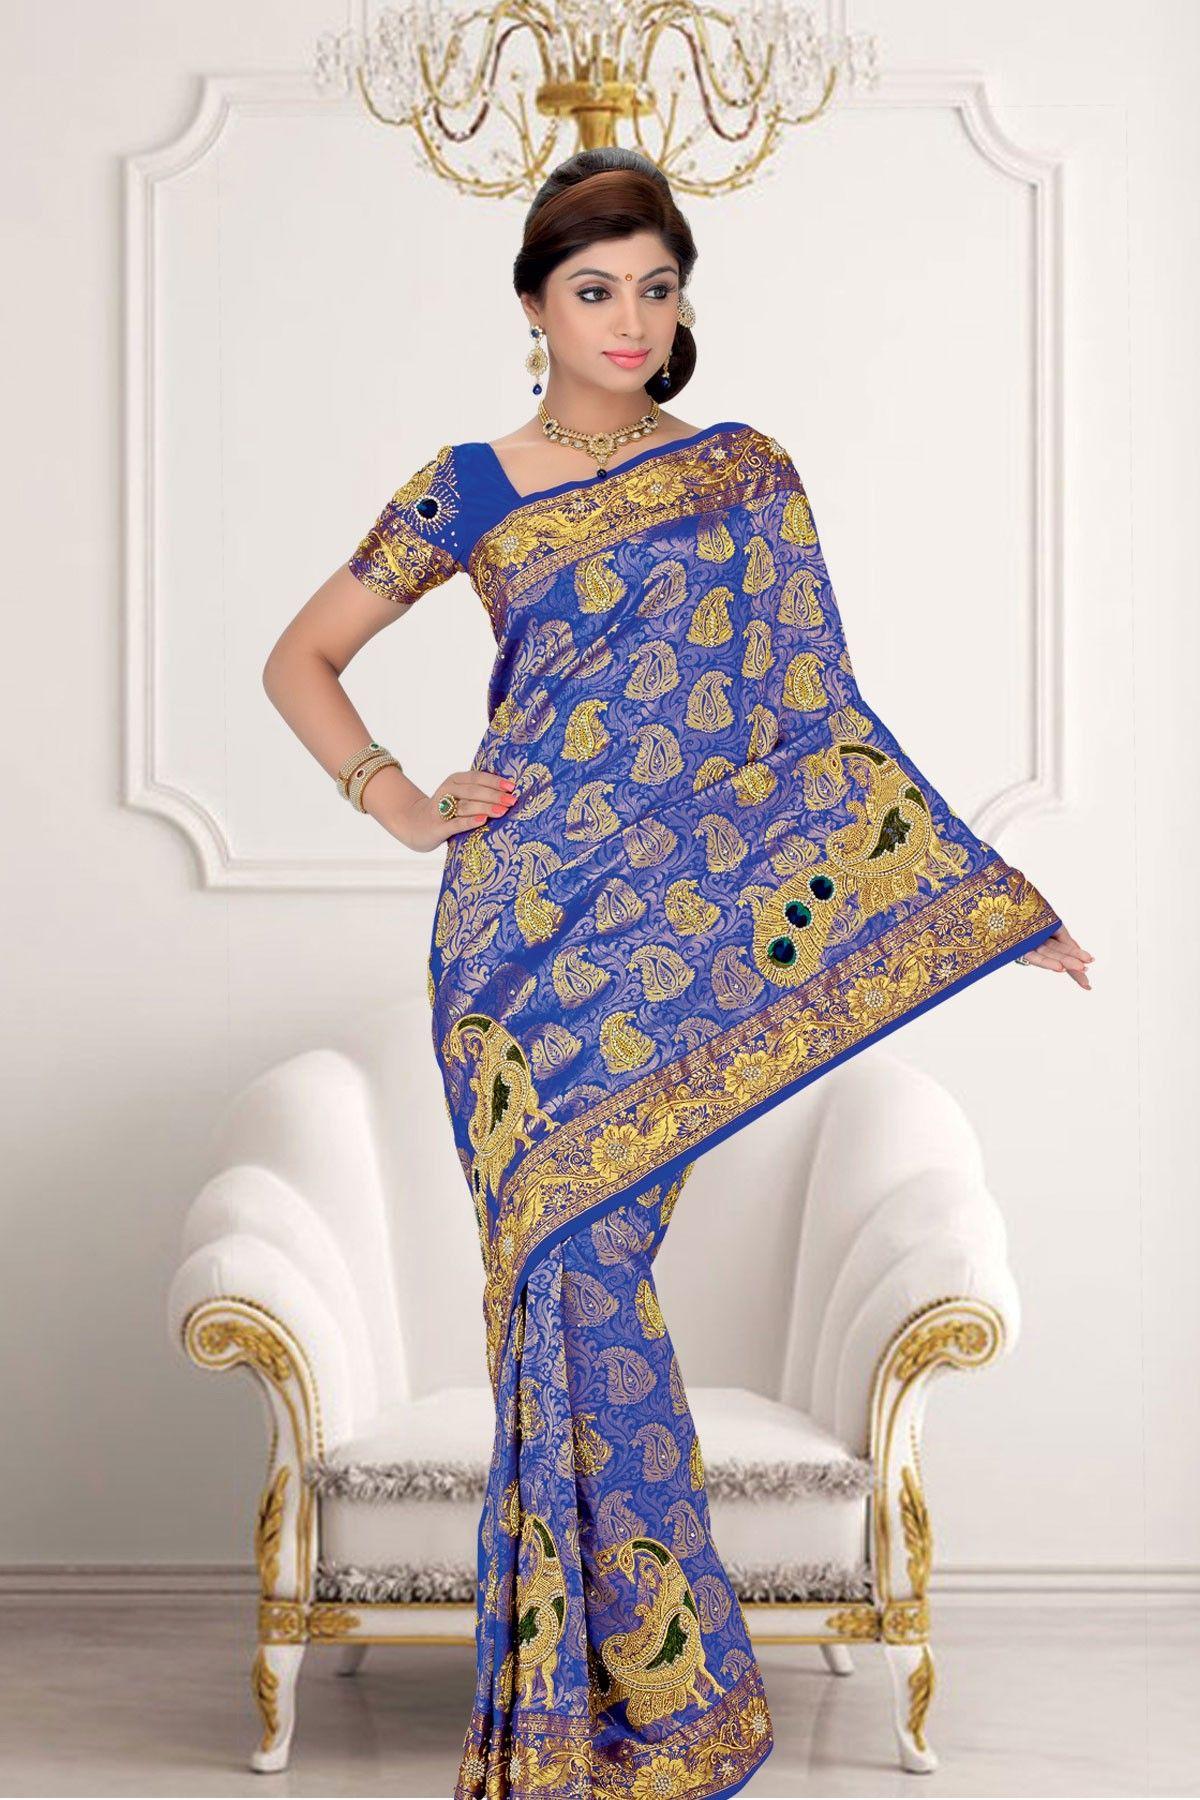 Trendy #Blue Zari weaved & Stone worked pure #silk saree in golden saree border & blue #Zari weaved & Stone worked pallu along with blue Zari weaved & Stone worked blouse in #golden border